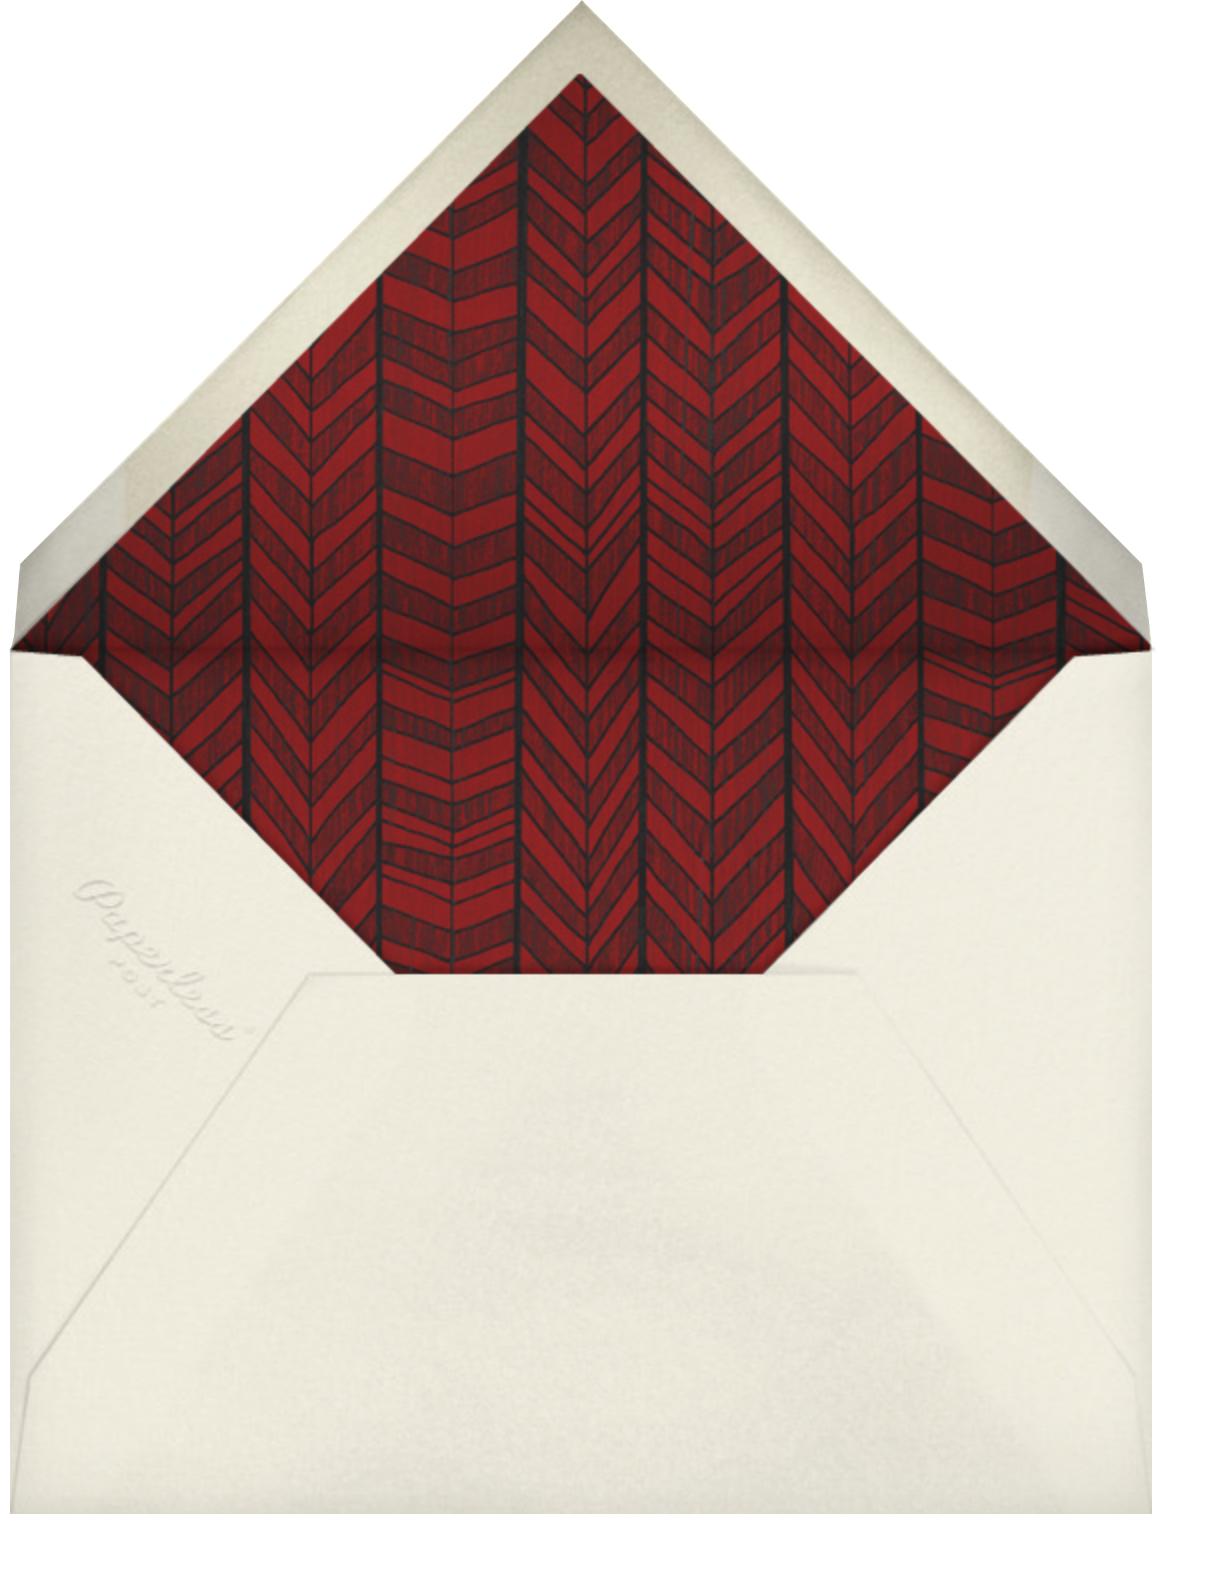 Deckle - Kumquat Square - Paperless Post - null - envelope back